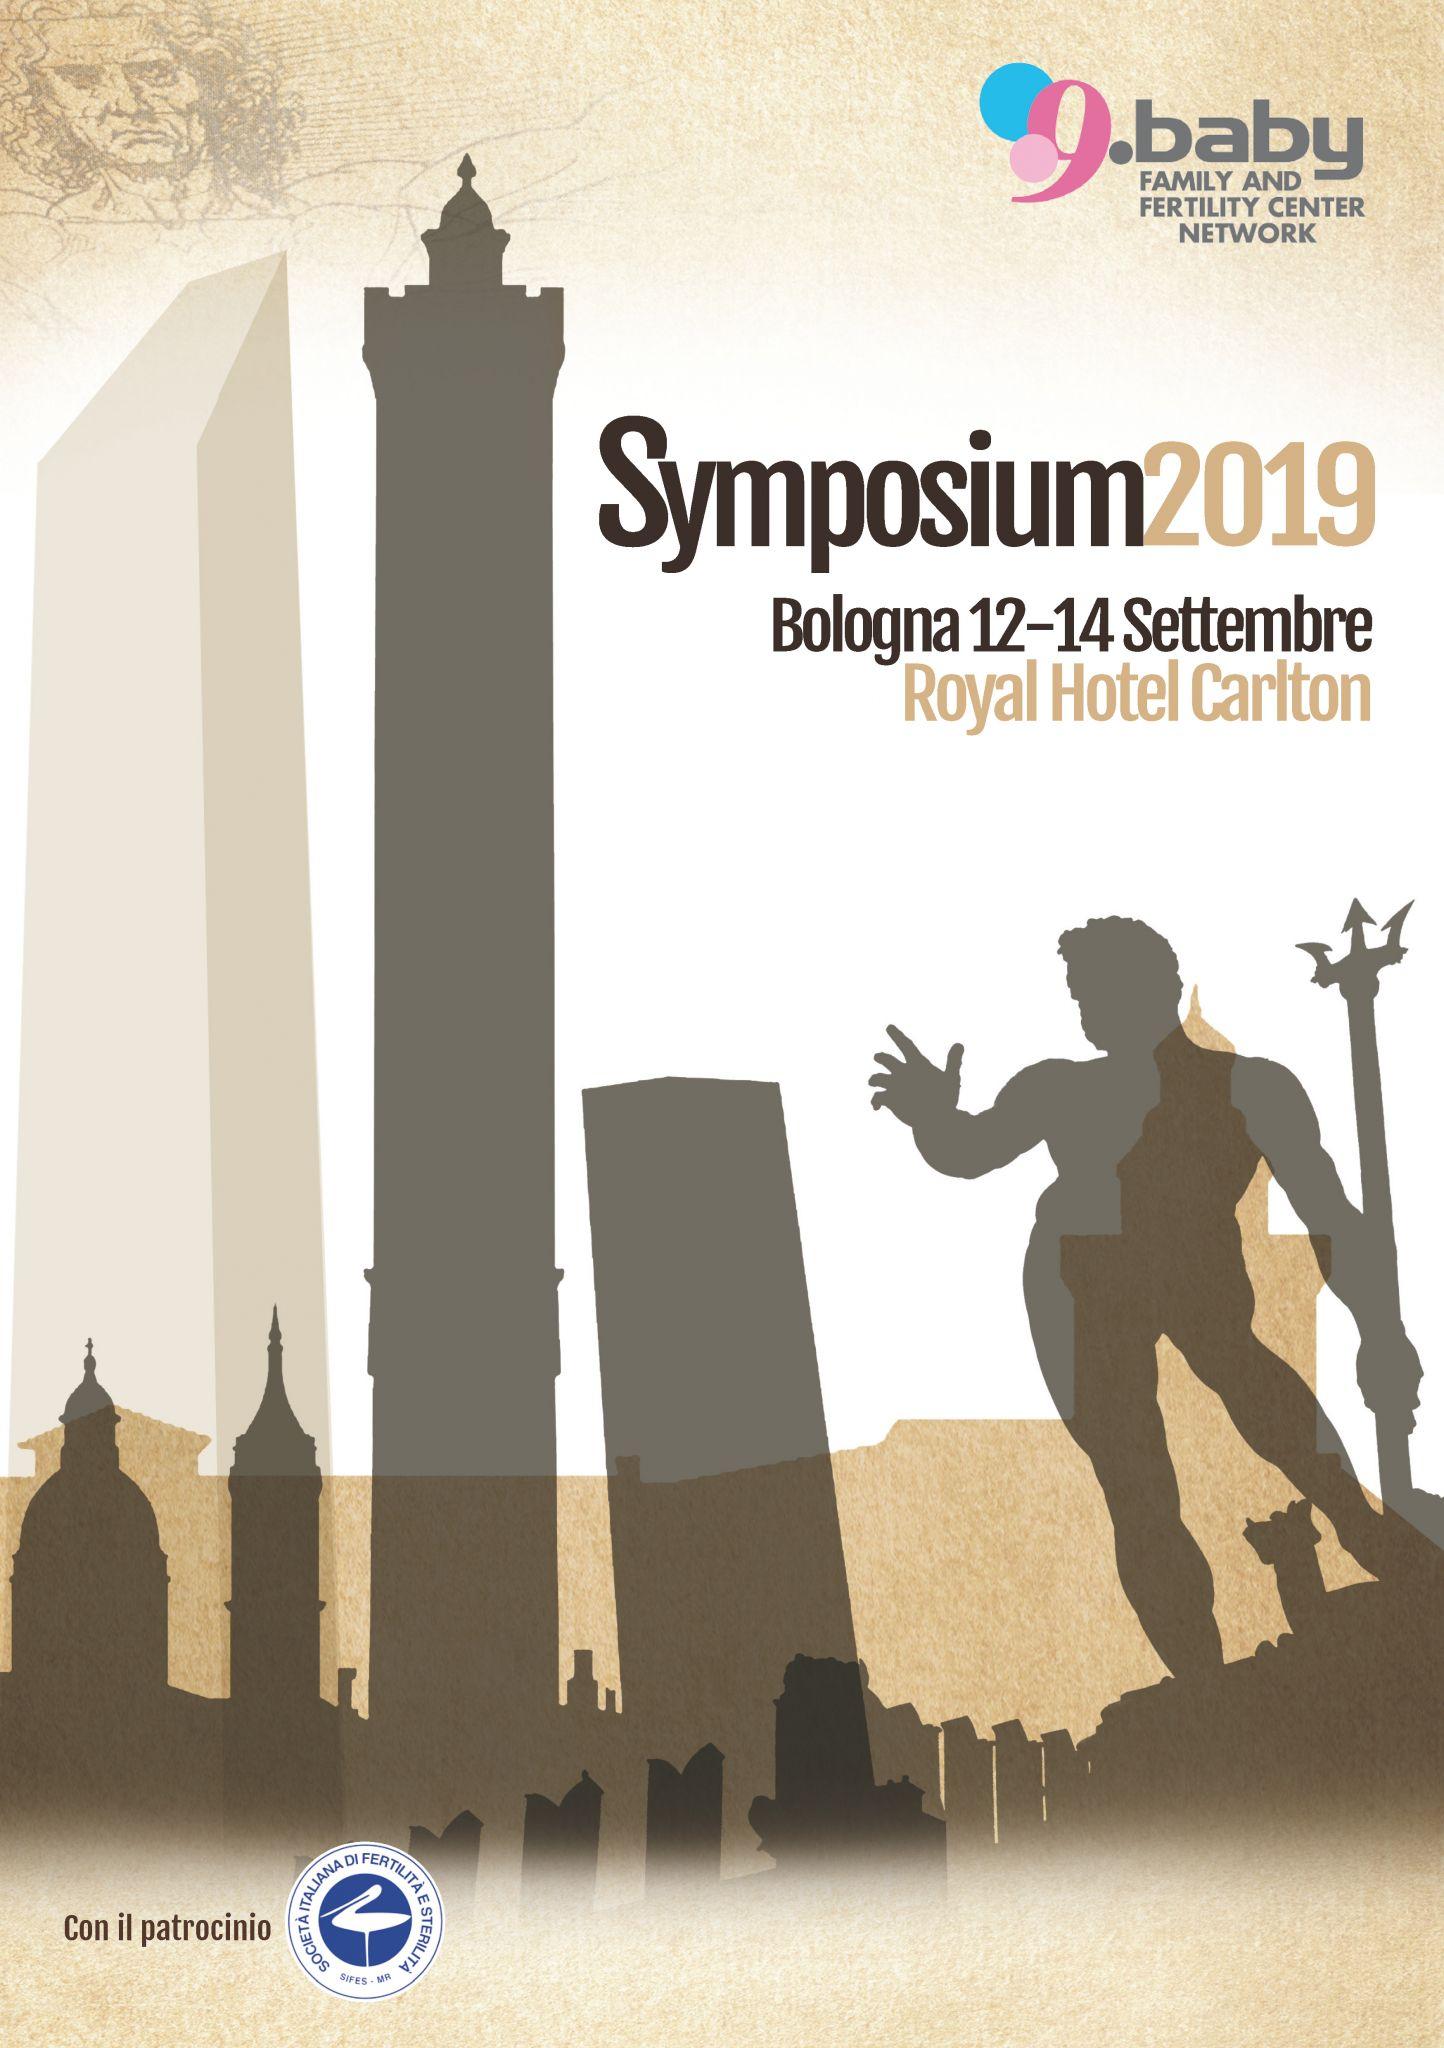 9.baby Symposium 2019: ecco il programma preliminare.